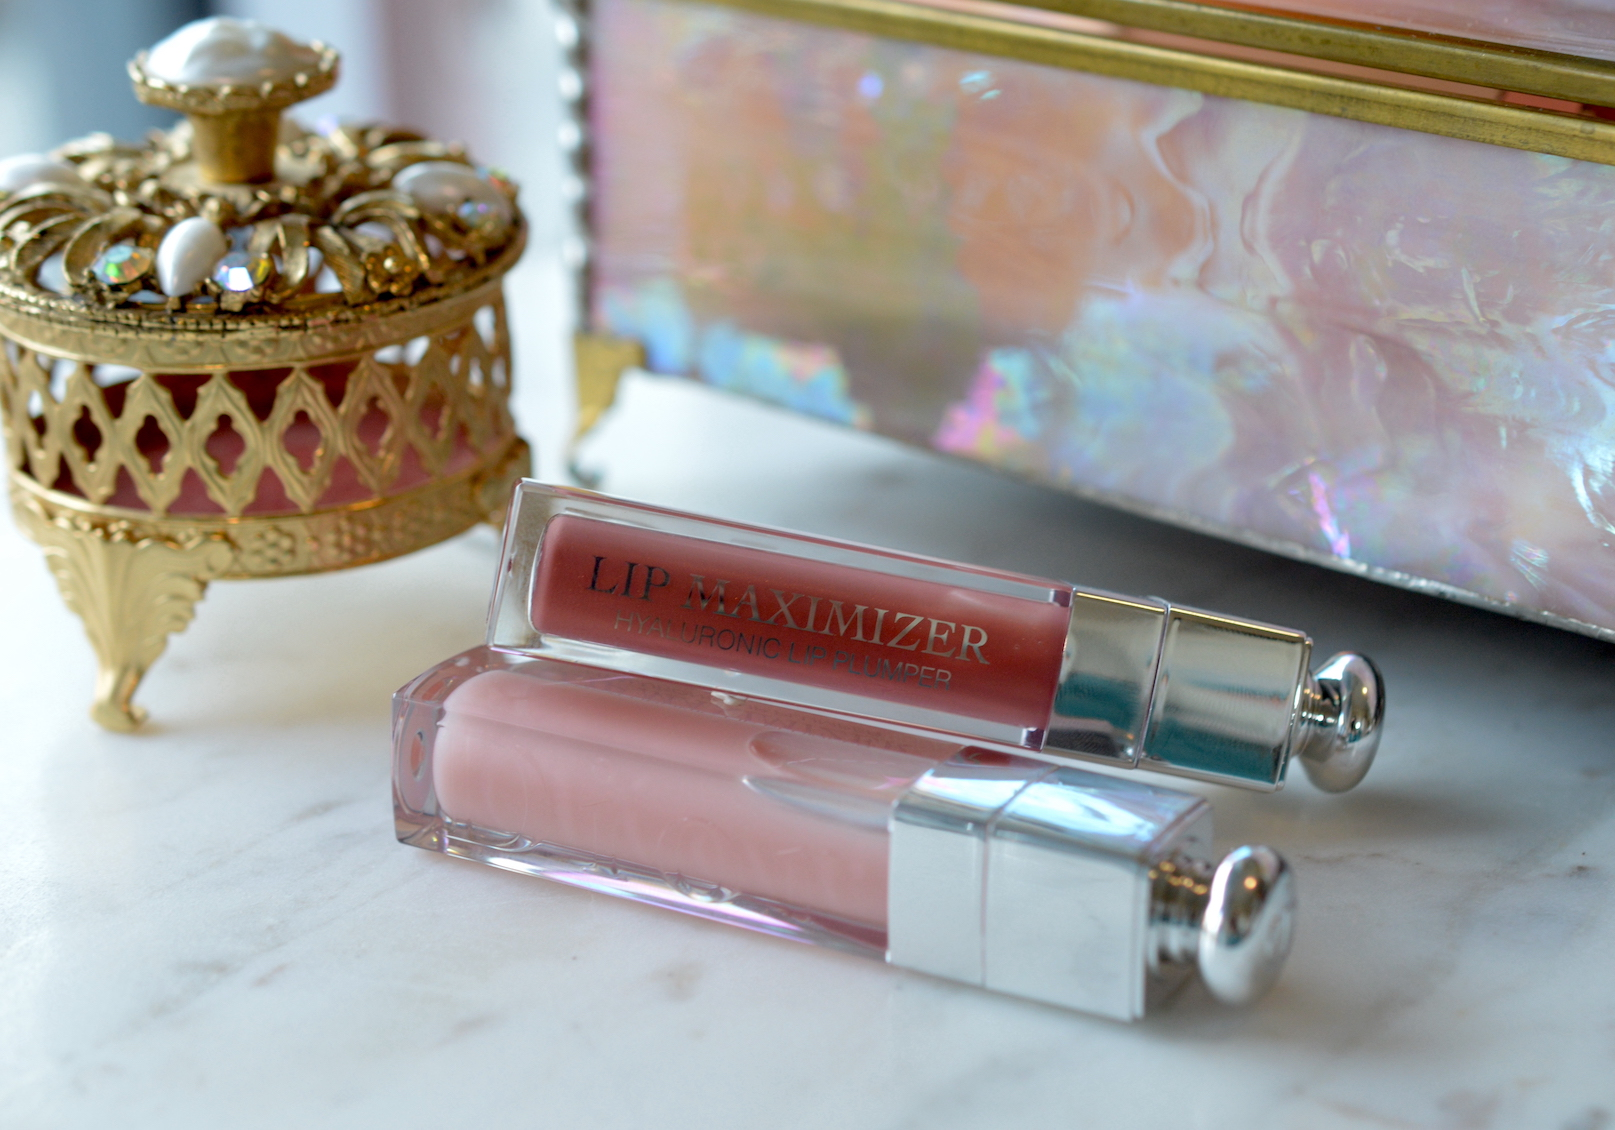 Dior Lip Maximizer gloss